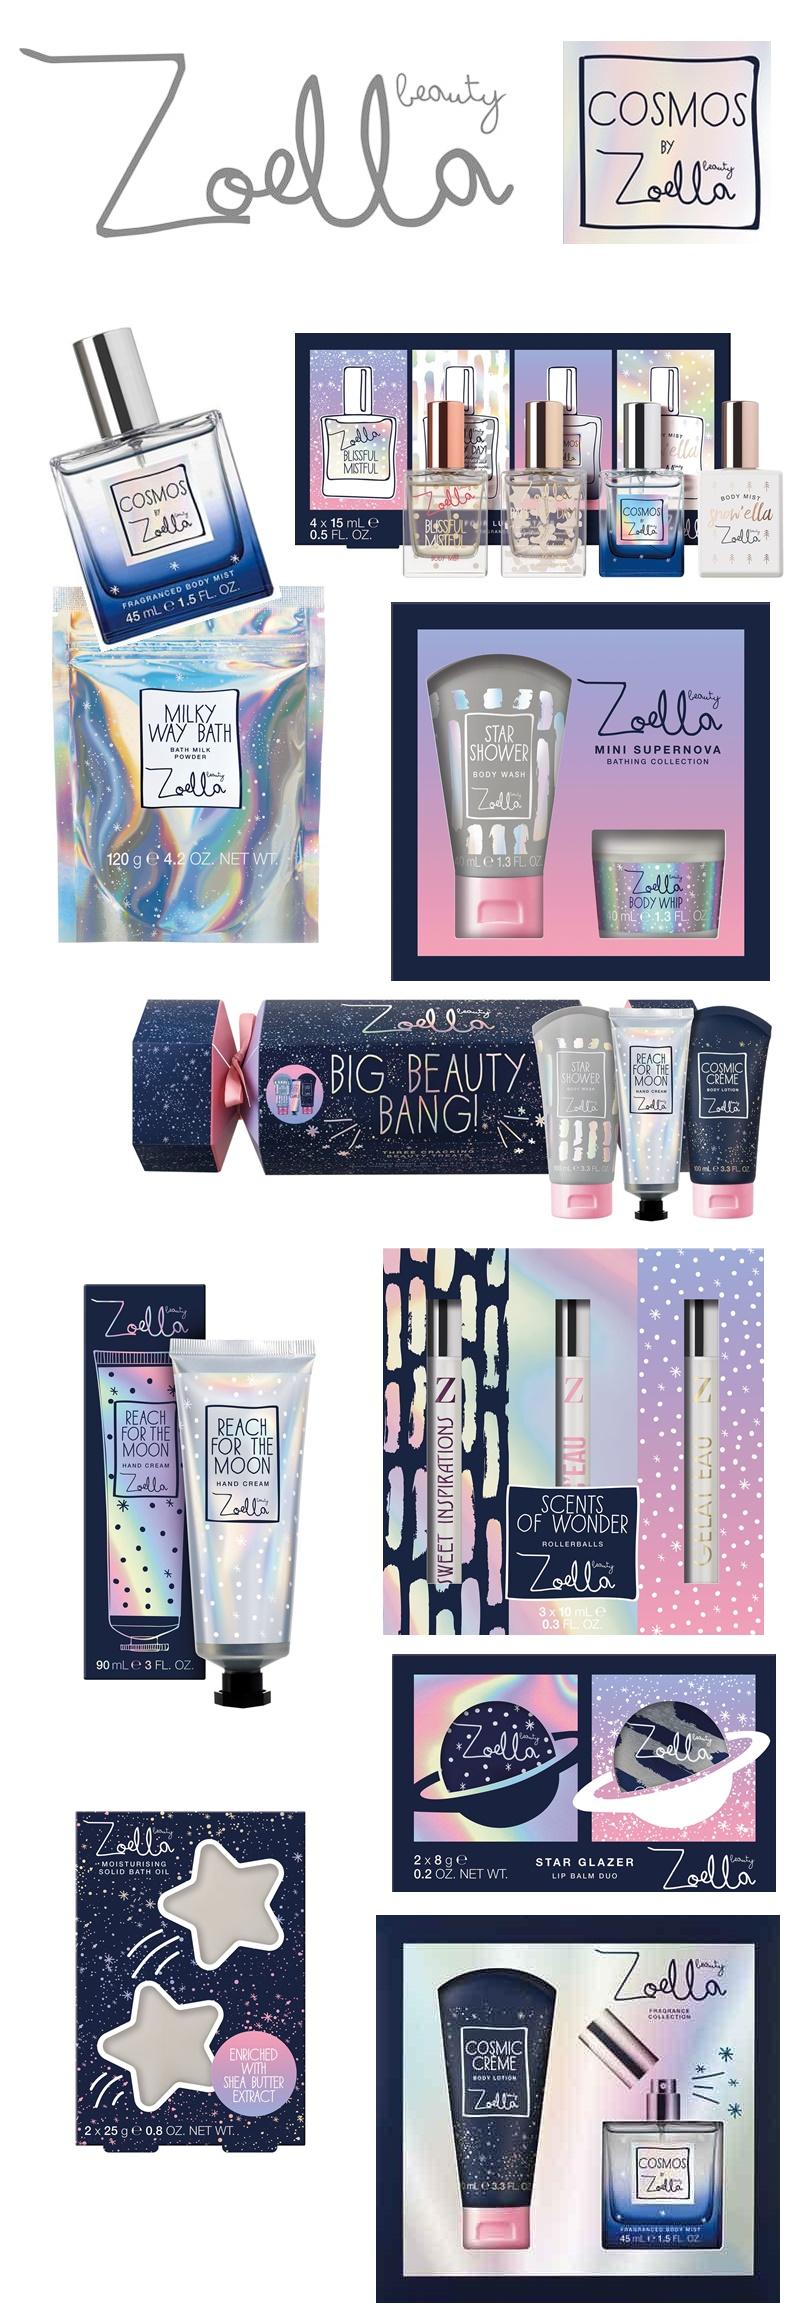 zoella-beauty-cosmos-christmas-range-2018